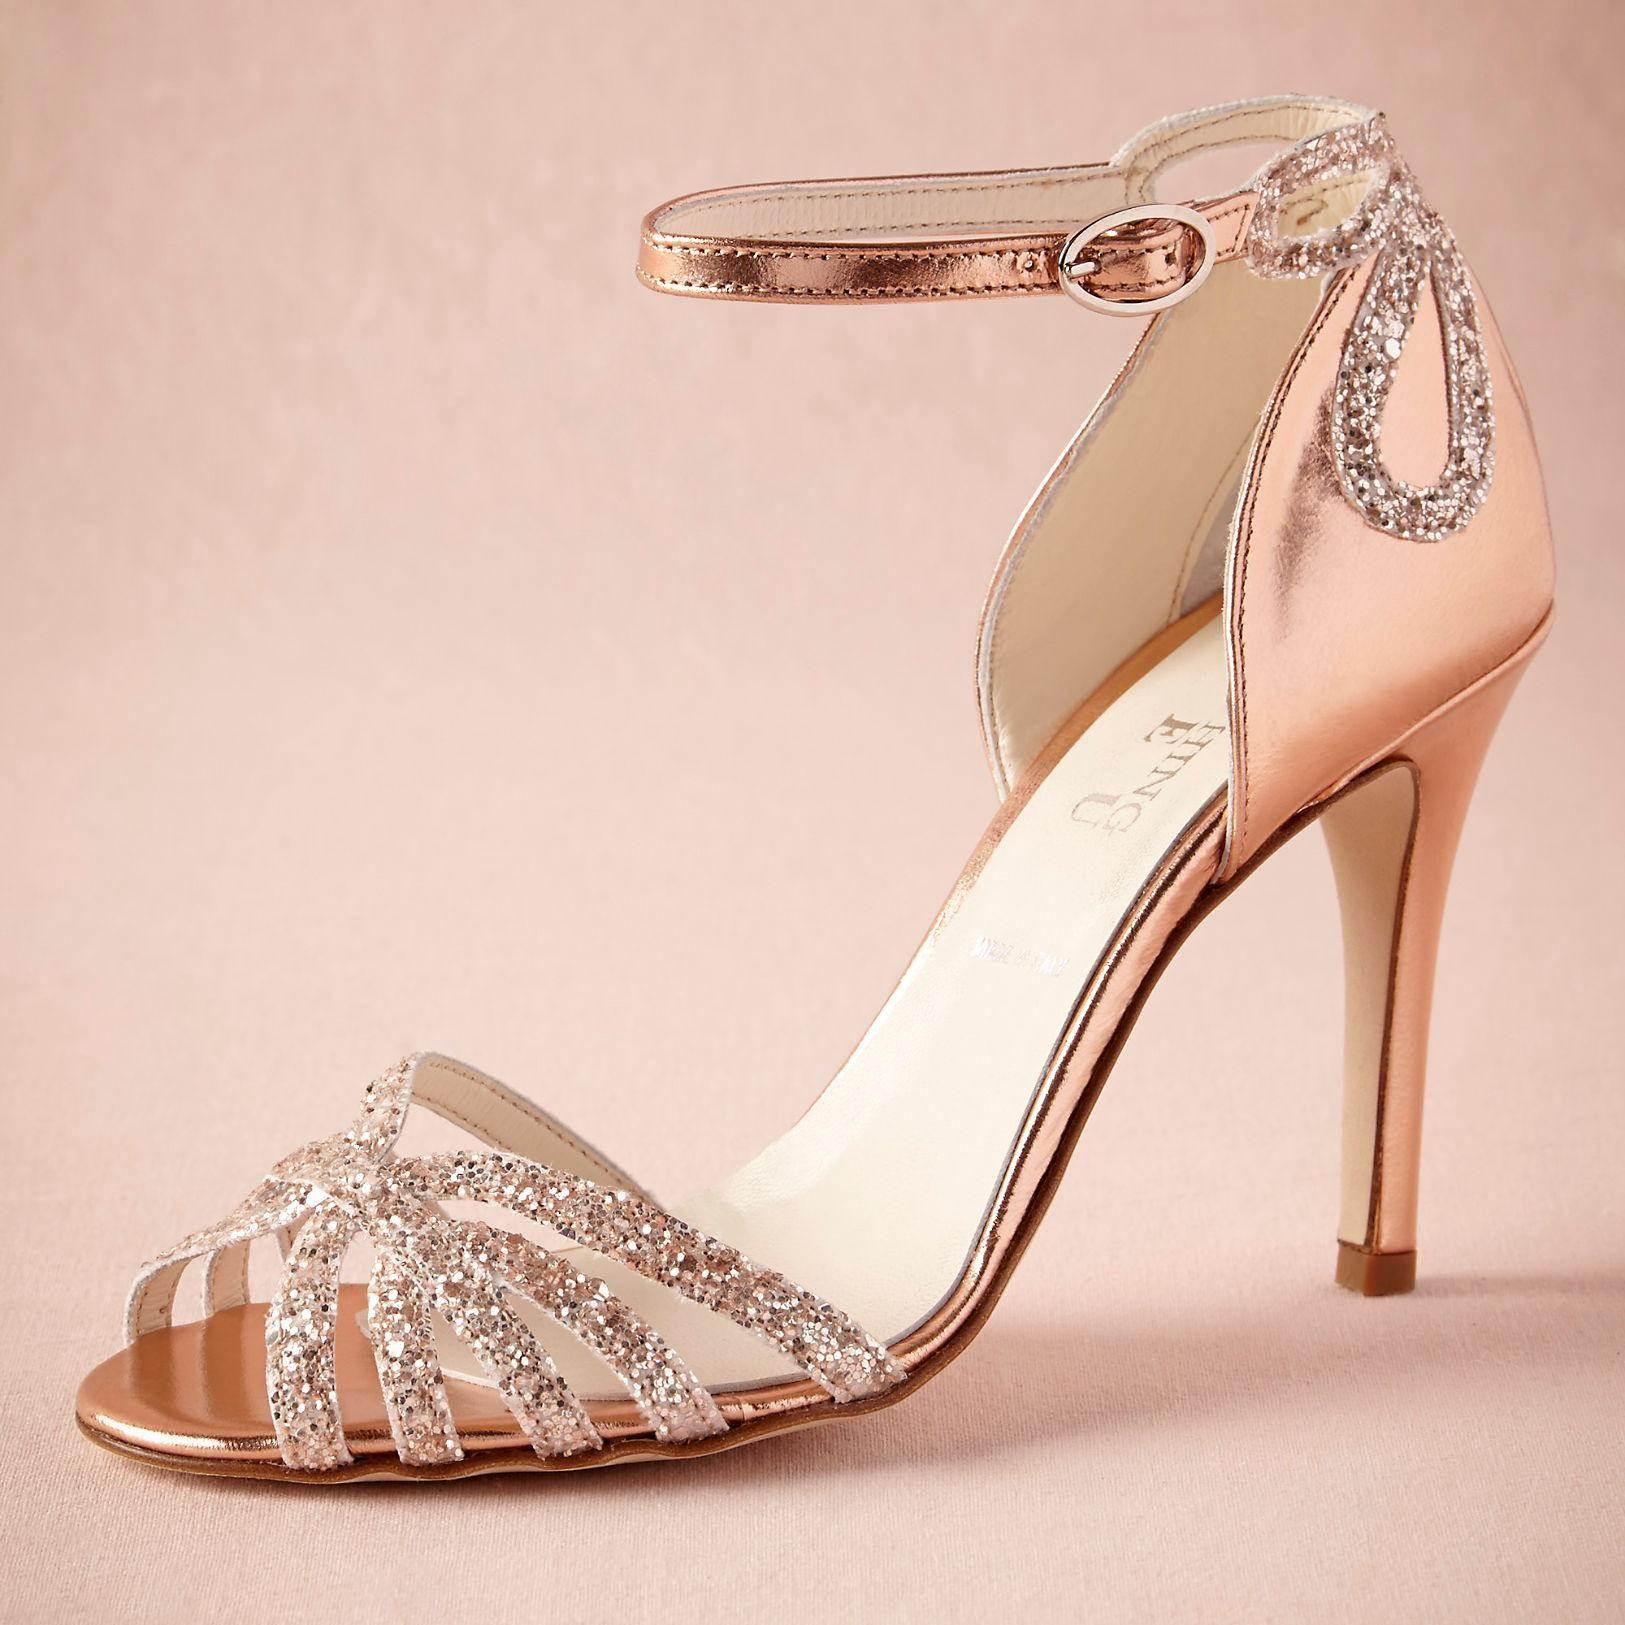 Rose Gold Glittered Heel Wedding Shoes